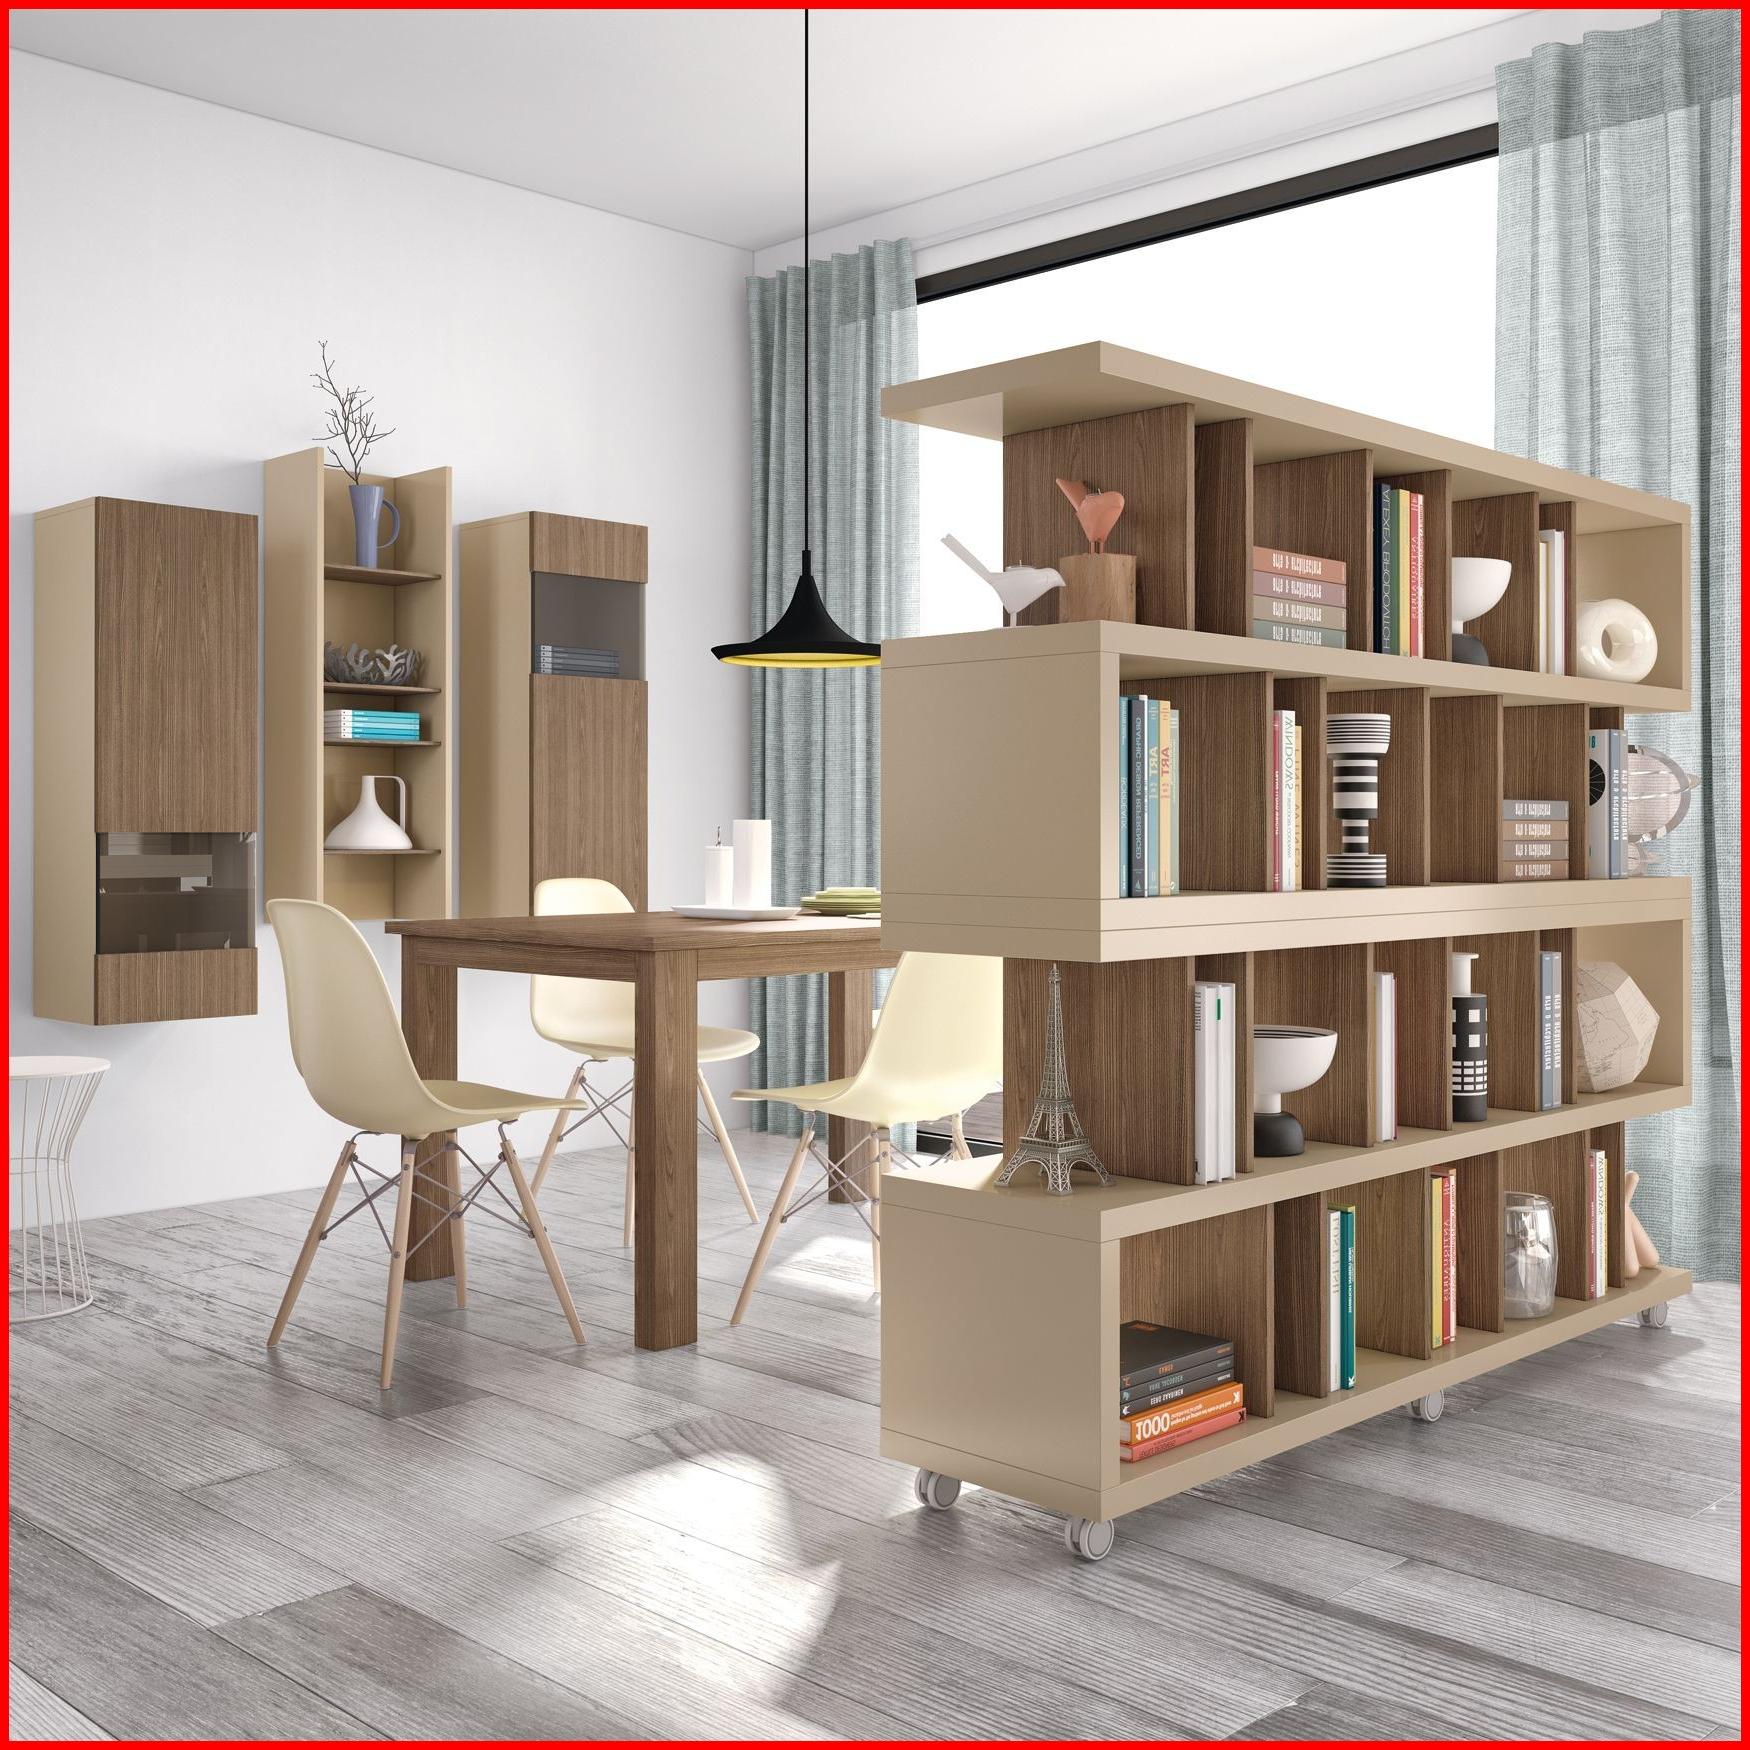 Muebles Separadores De Ambientes J7do Mueble Separador De Ambientes Separadores De Ambiente